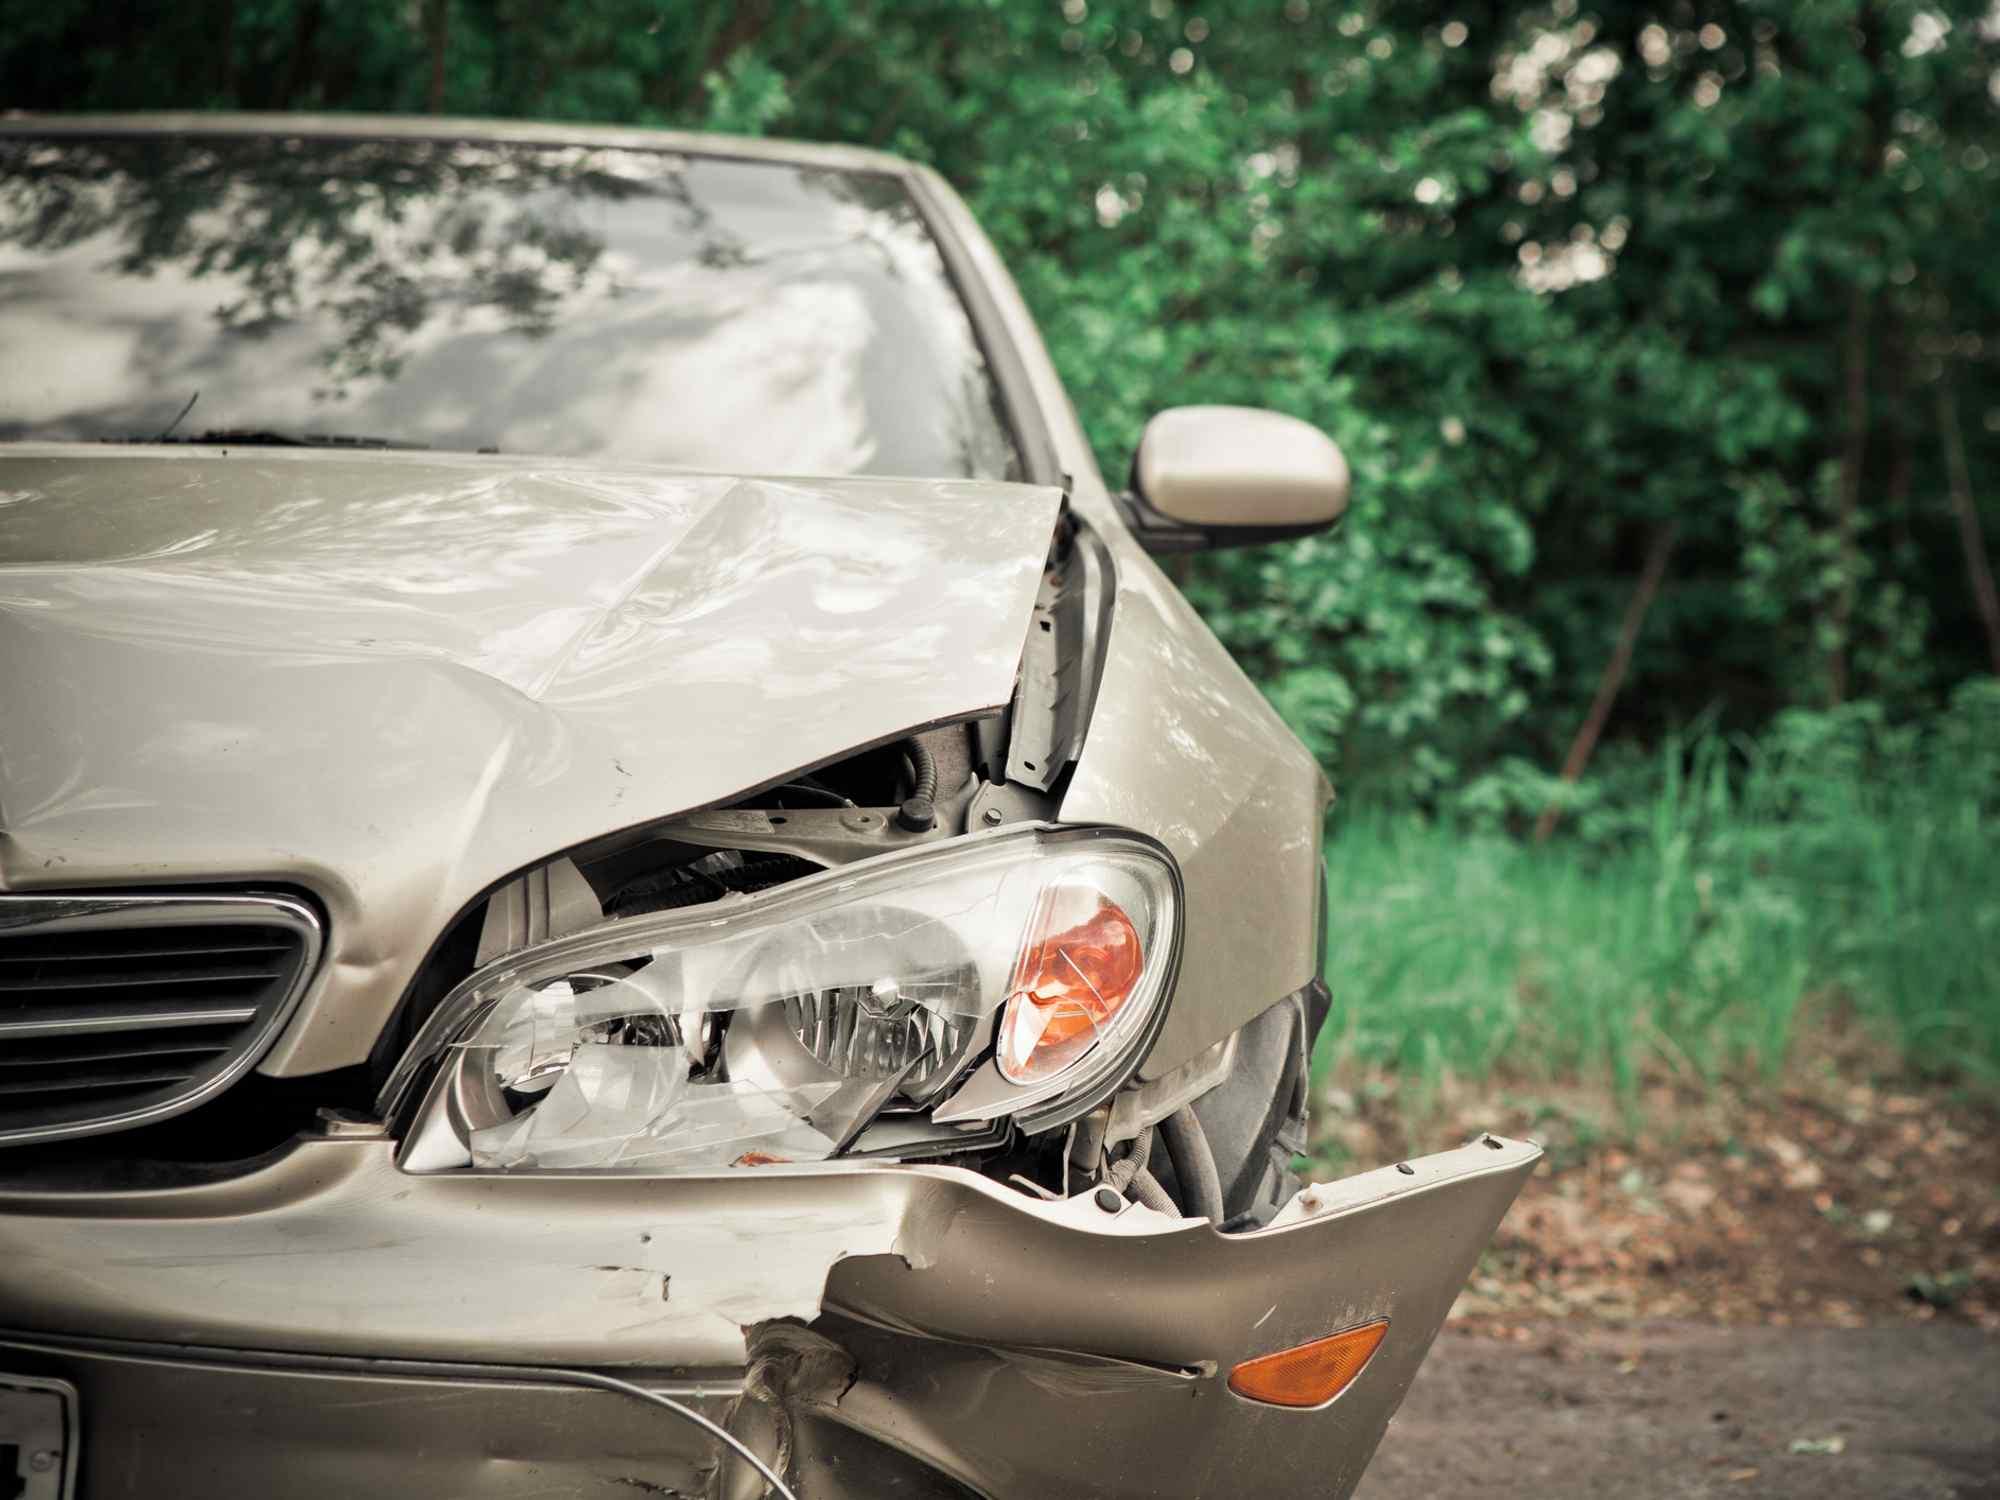 Estimated Costs for 5 Common Auto Body Repairs